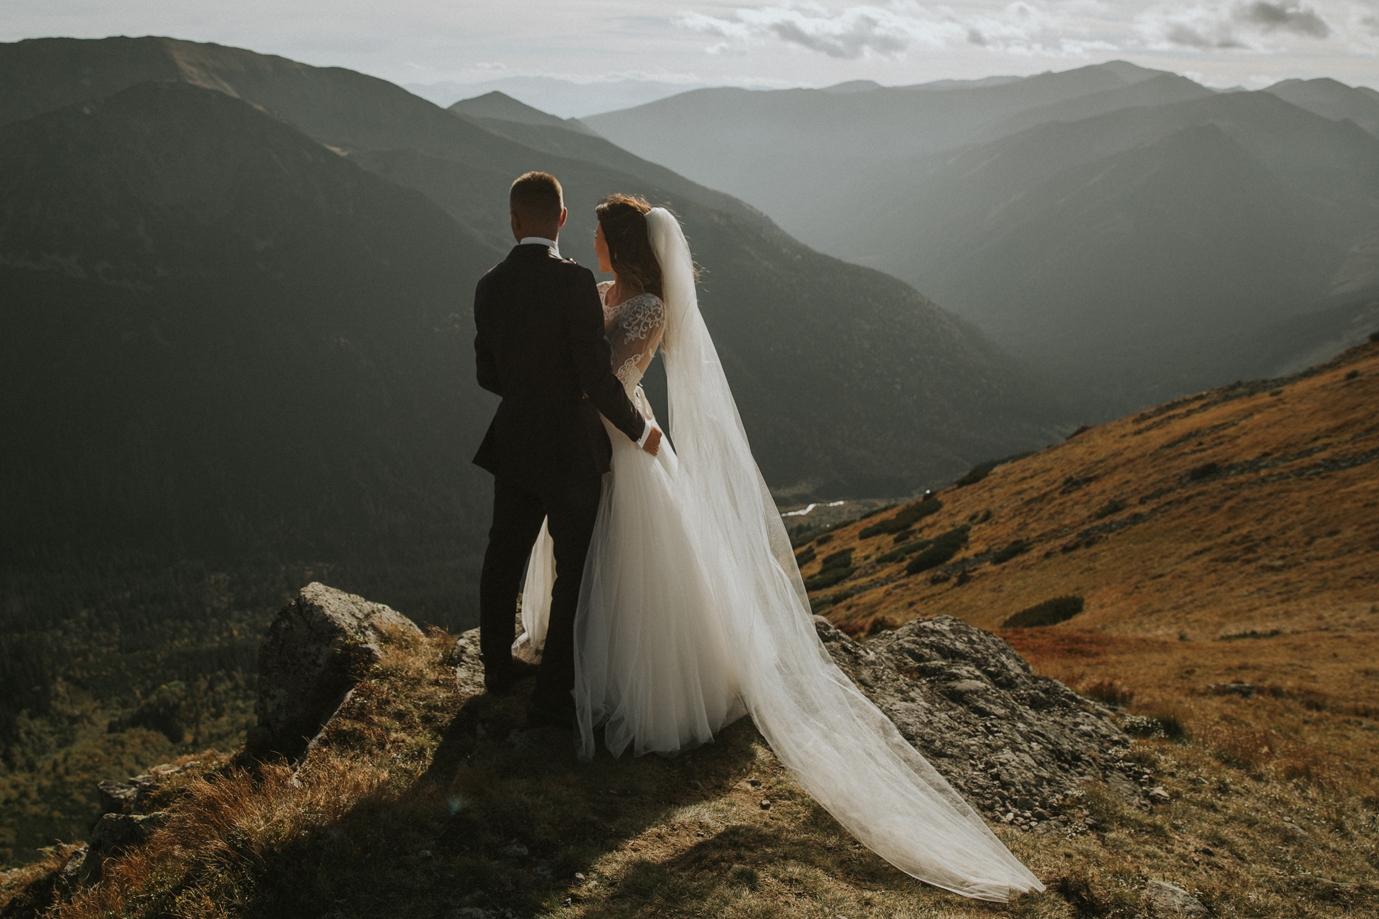 mountains_Klaudia&Dawid_weddingphotographer029.jpg